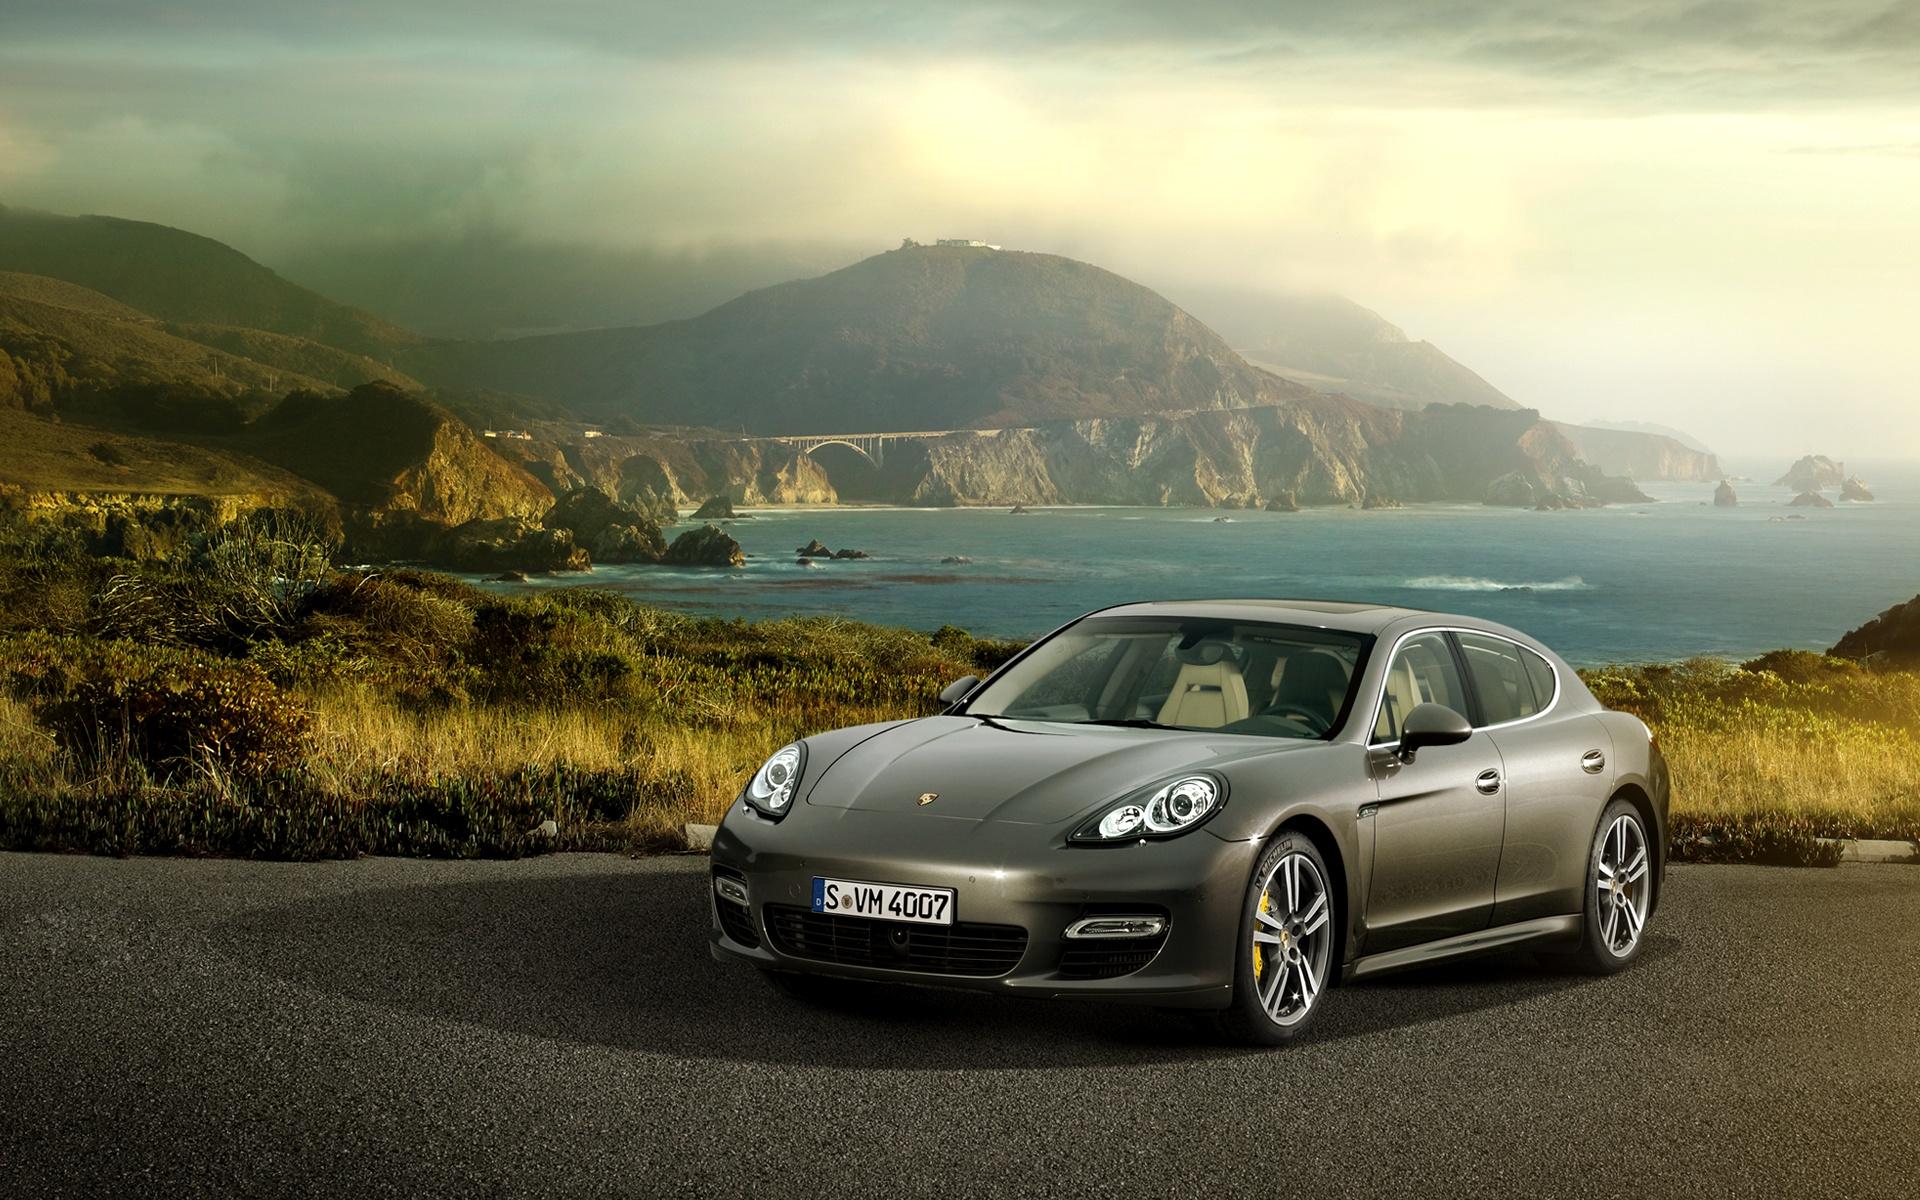 Download Porsche Panamera Dusky Hd Wallpaper